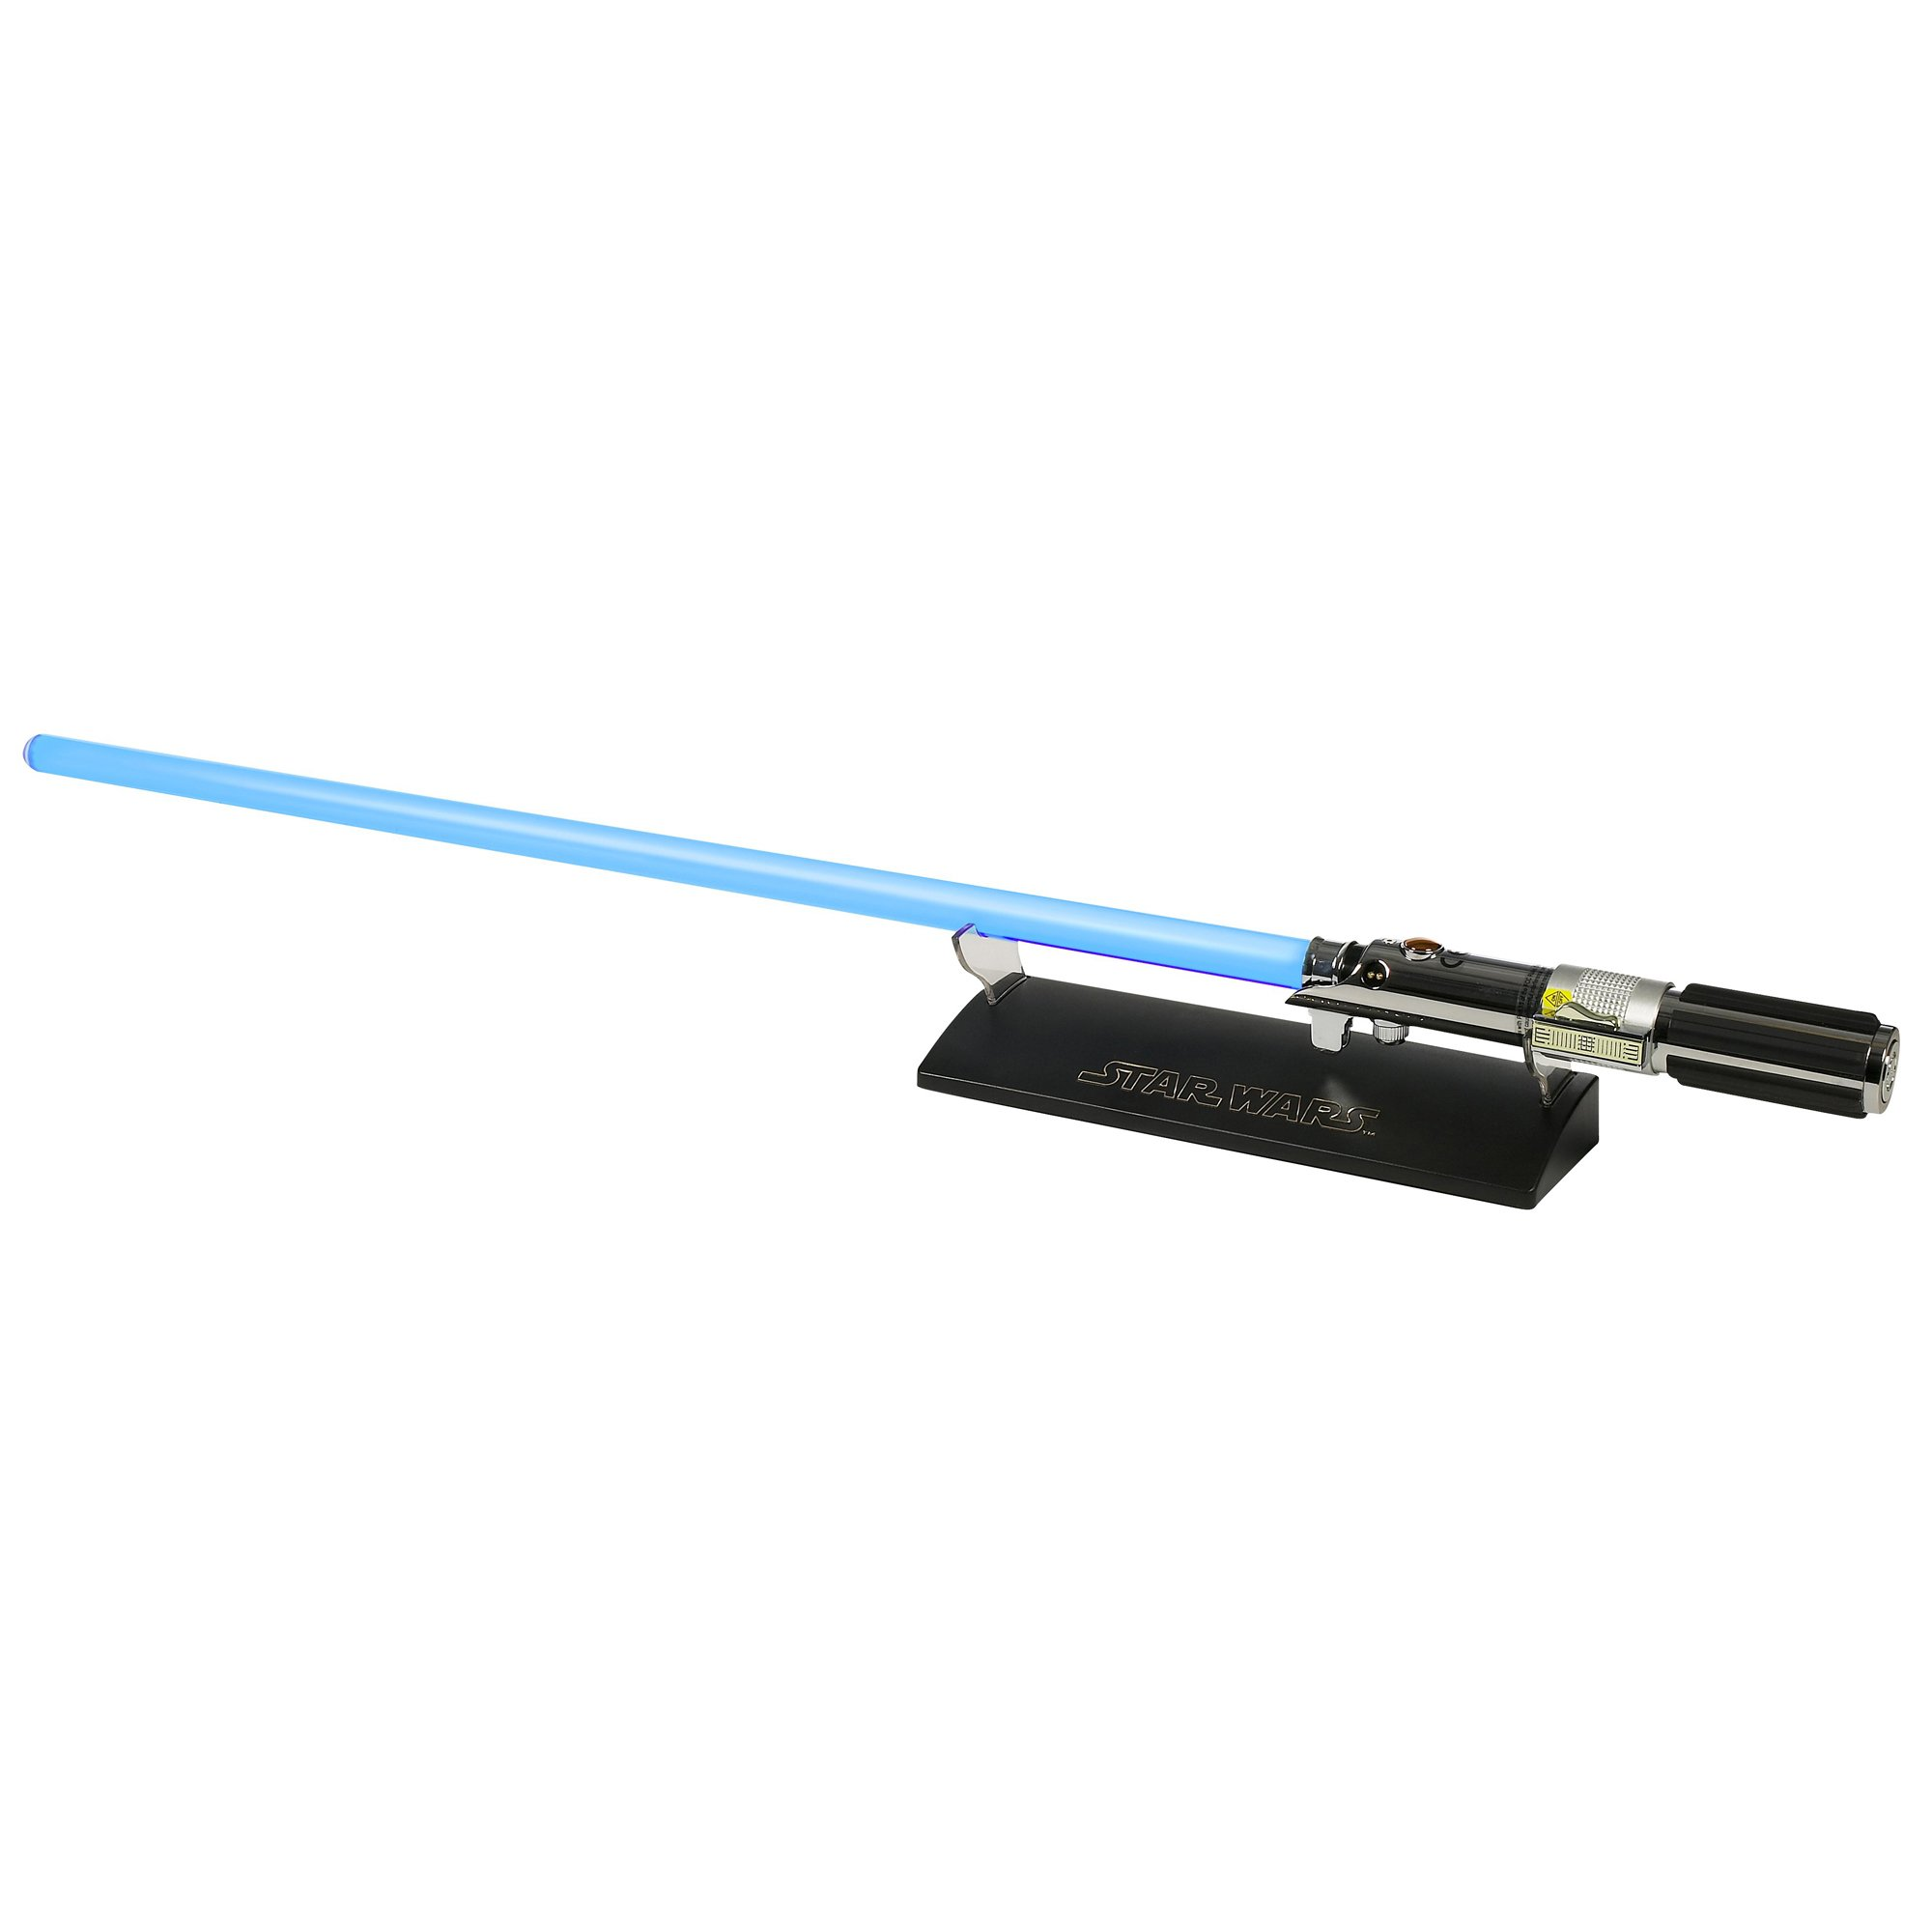 Star Wars Signature Series Force FX Lightsaber - Anakin Skywalker by Hasbro (Image #1)